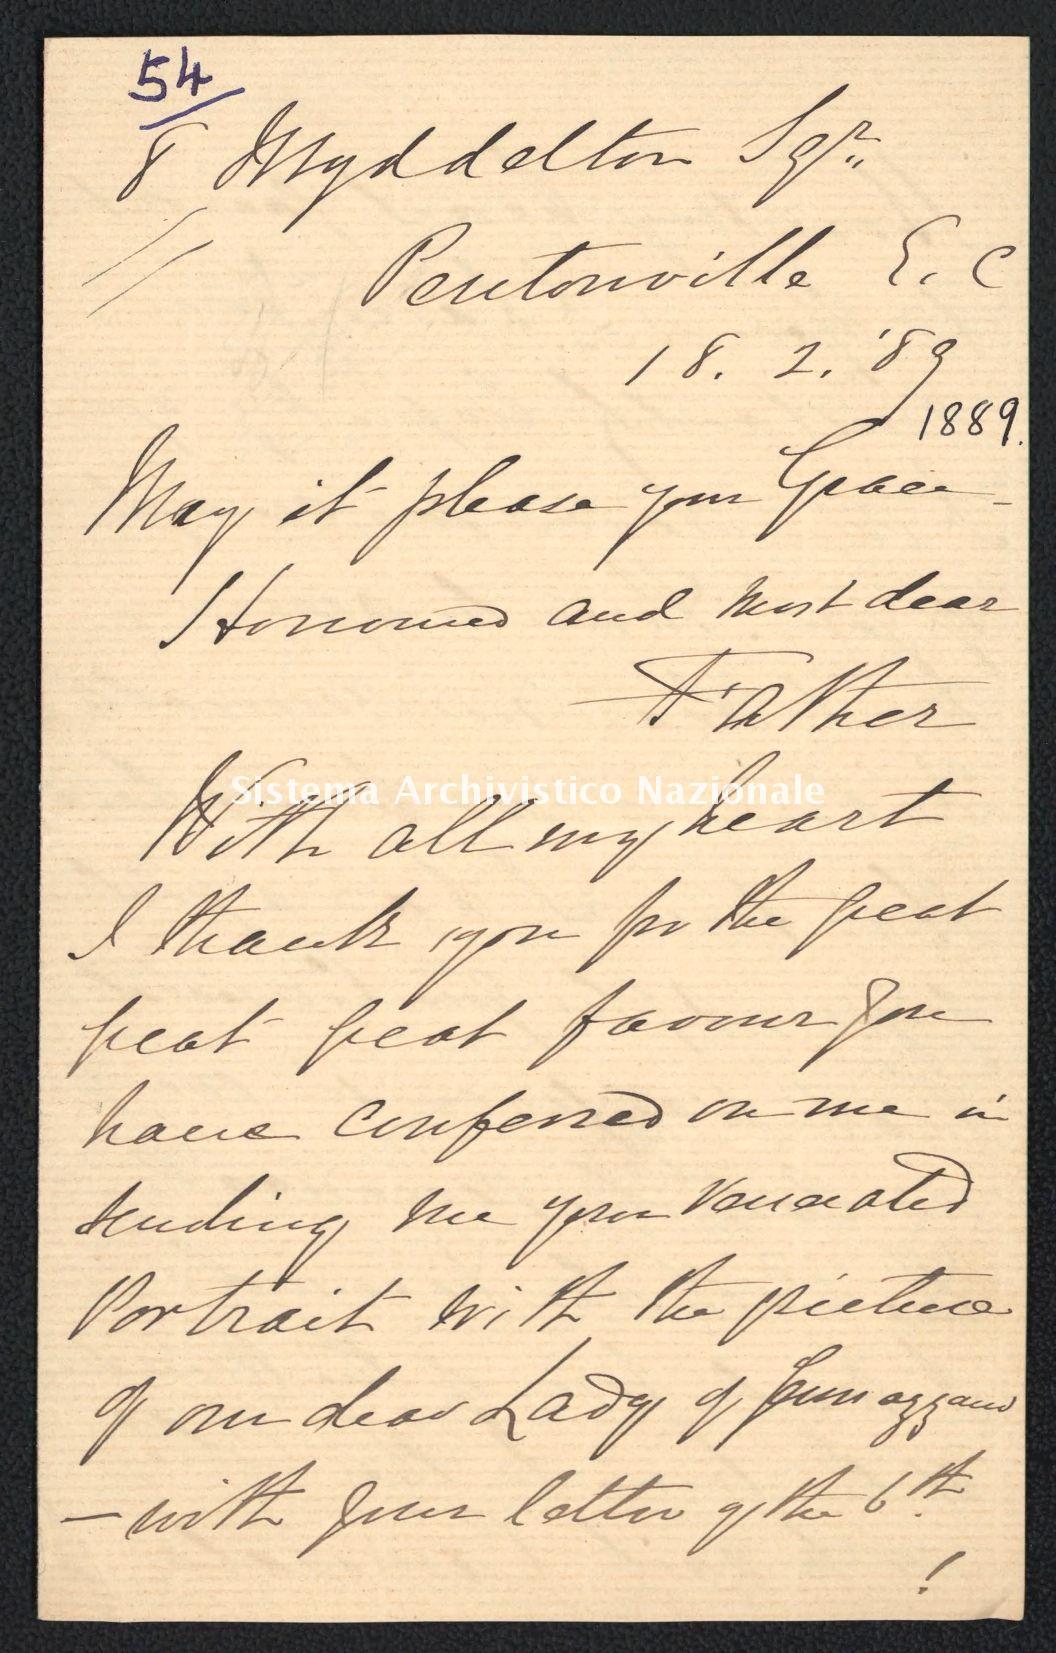 Pontificio Collegio Irlandese - Kirby_1889_54